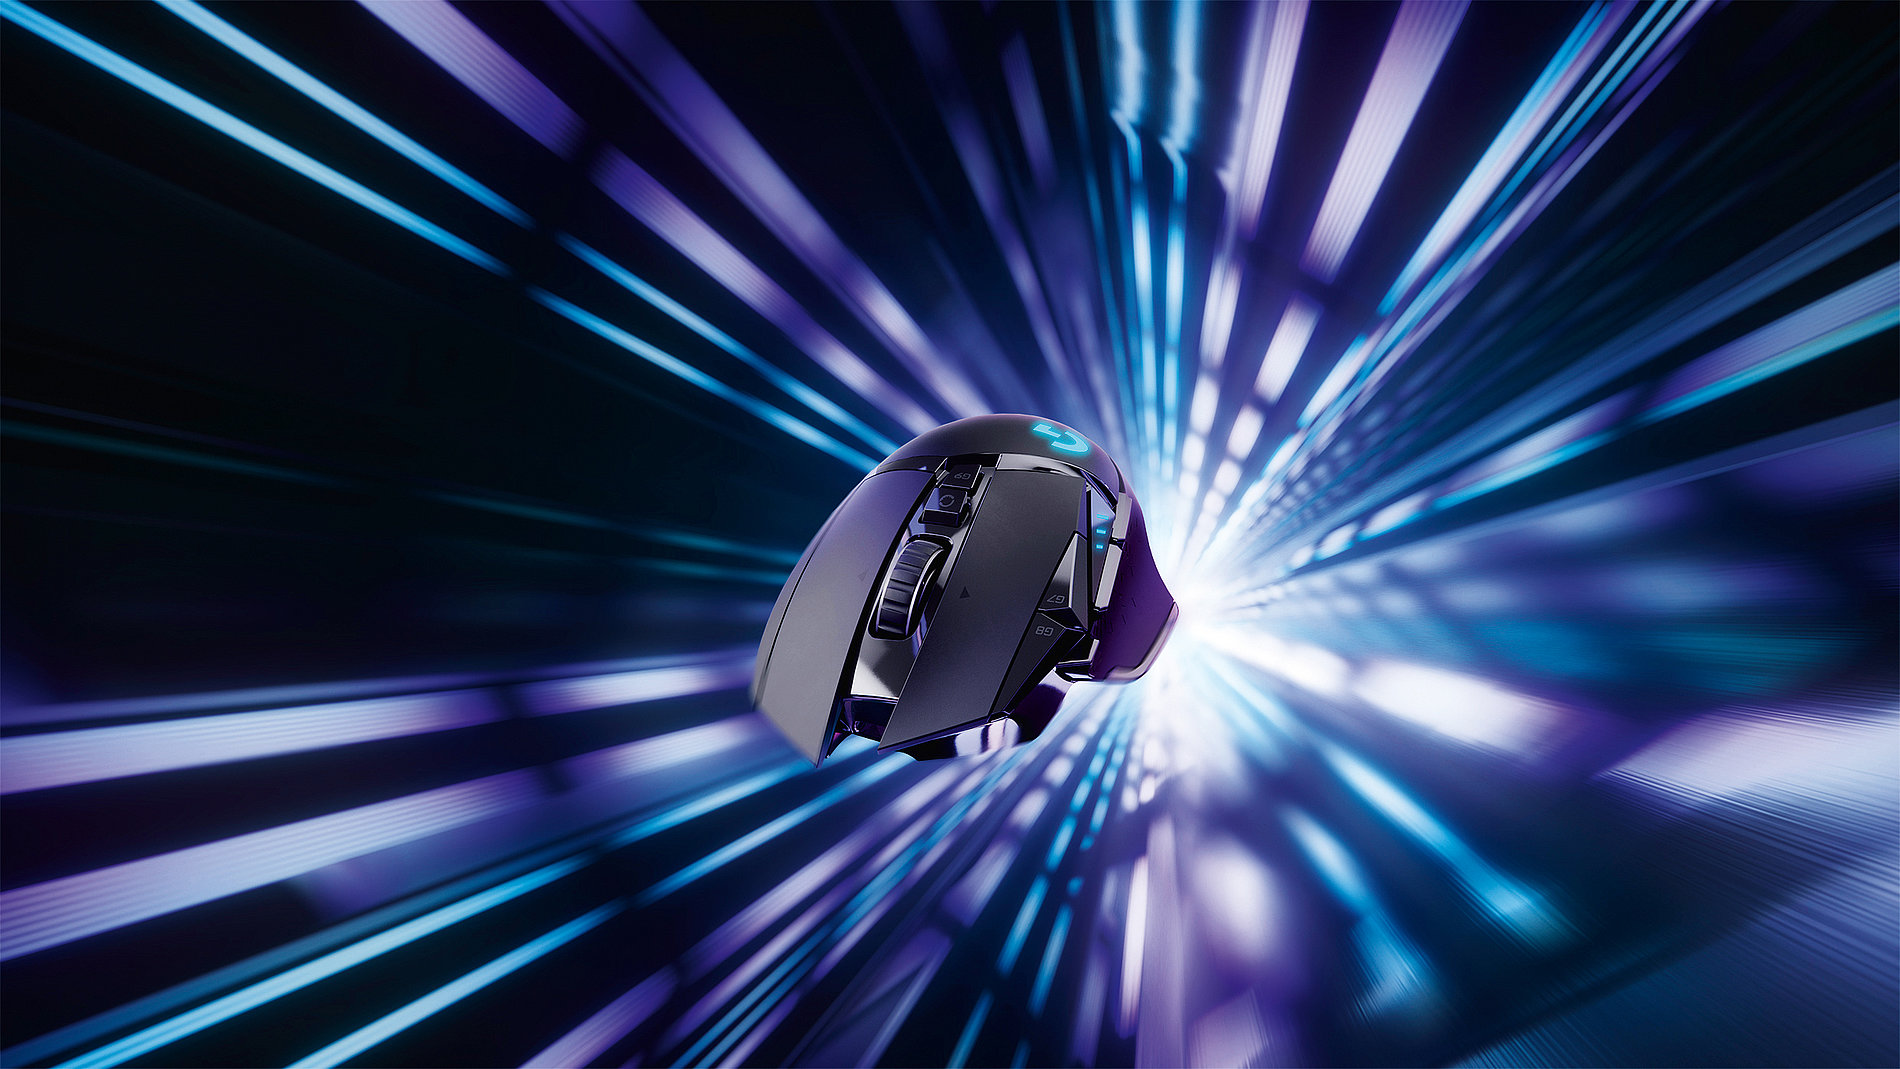 Logitech G502 LIGHTSPEED Wireless Gaming Mouse | Red Dot Design Award